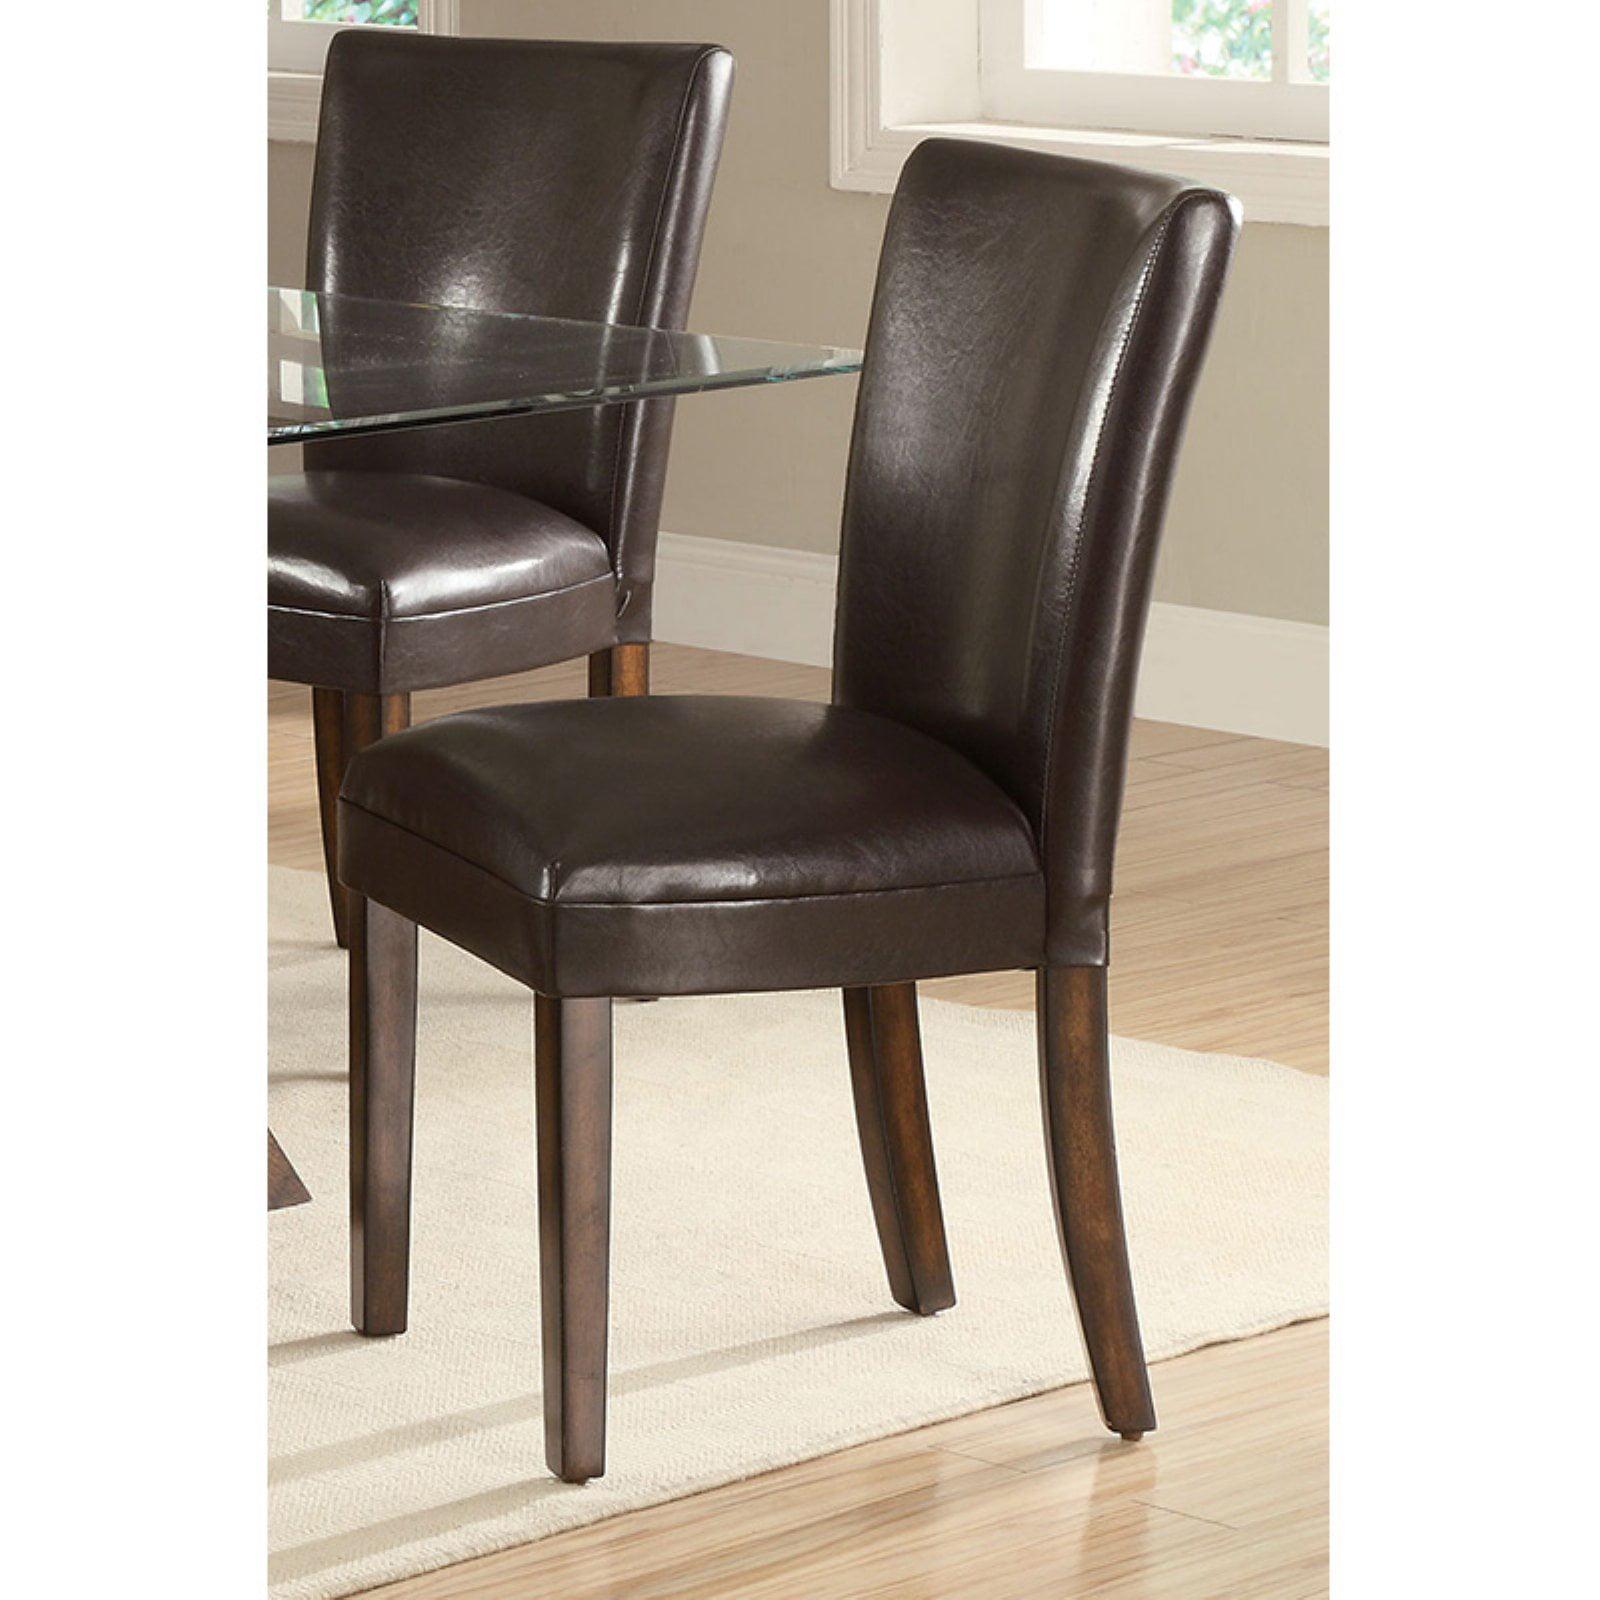 Coaster Furniture Nessa Brown Vinyl Parsons Chair - Set of 2